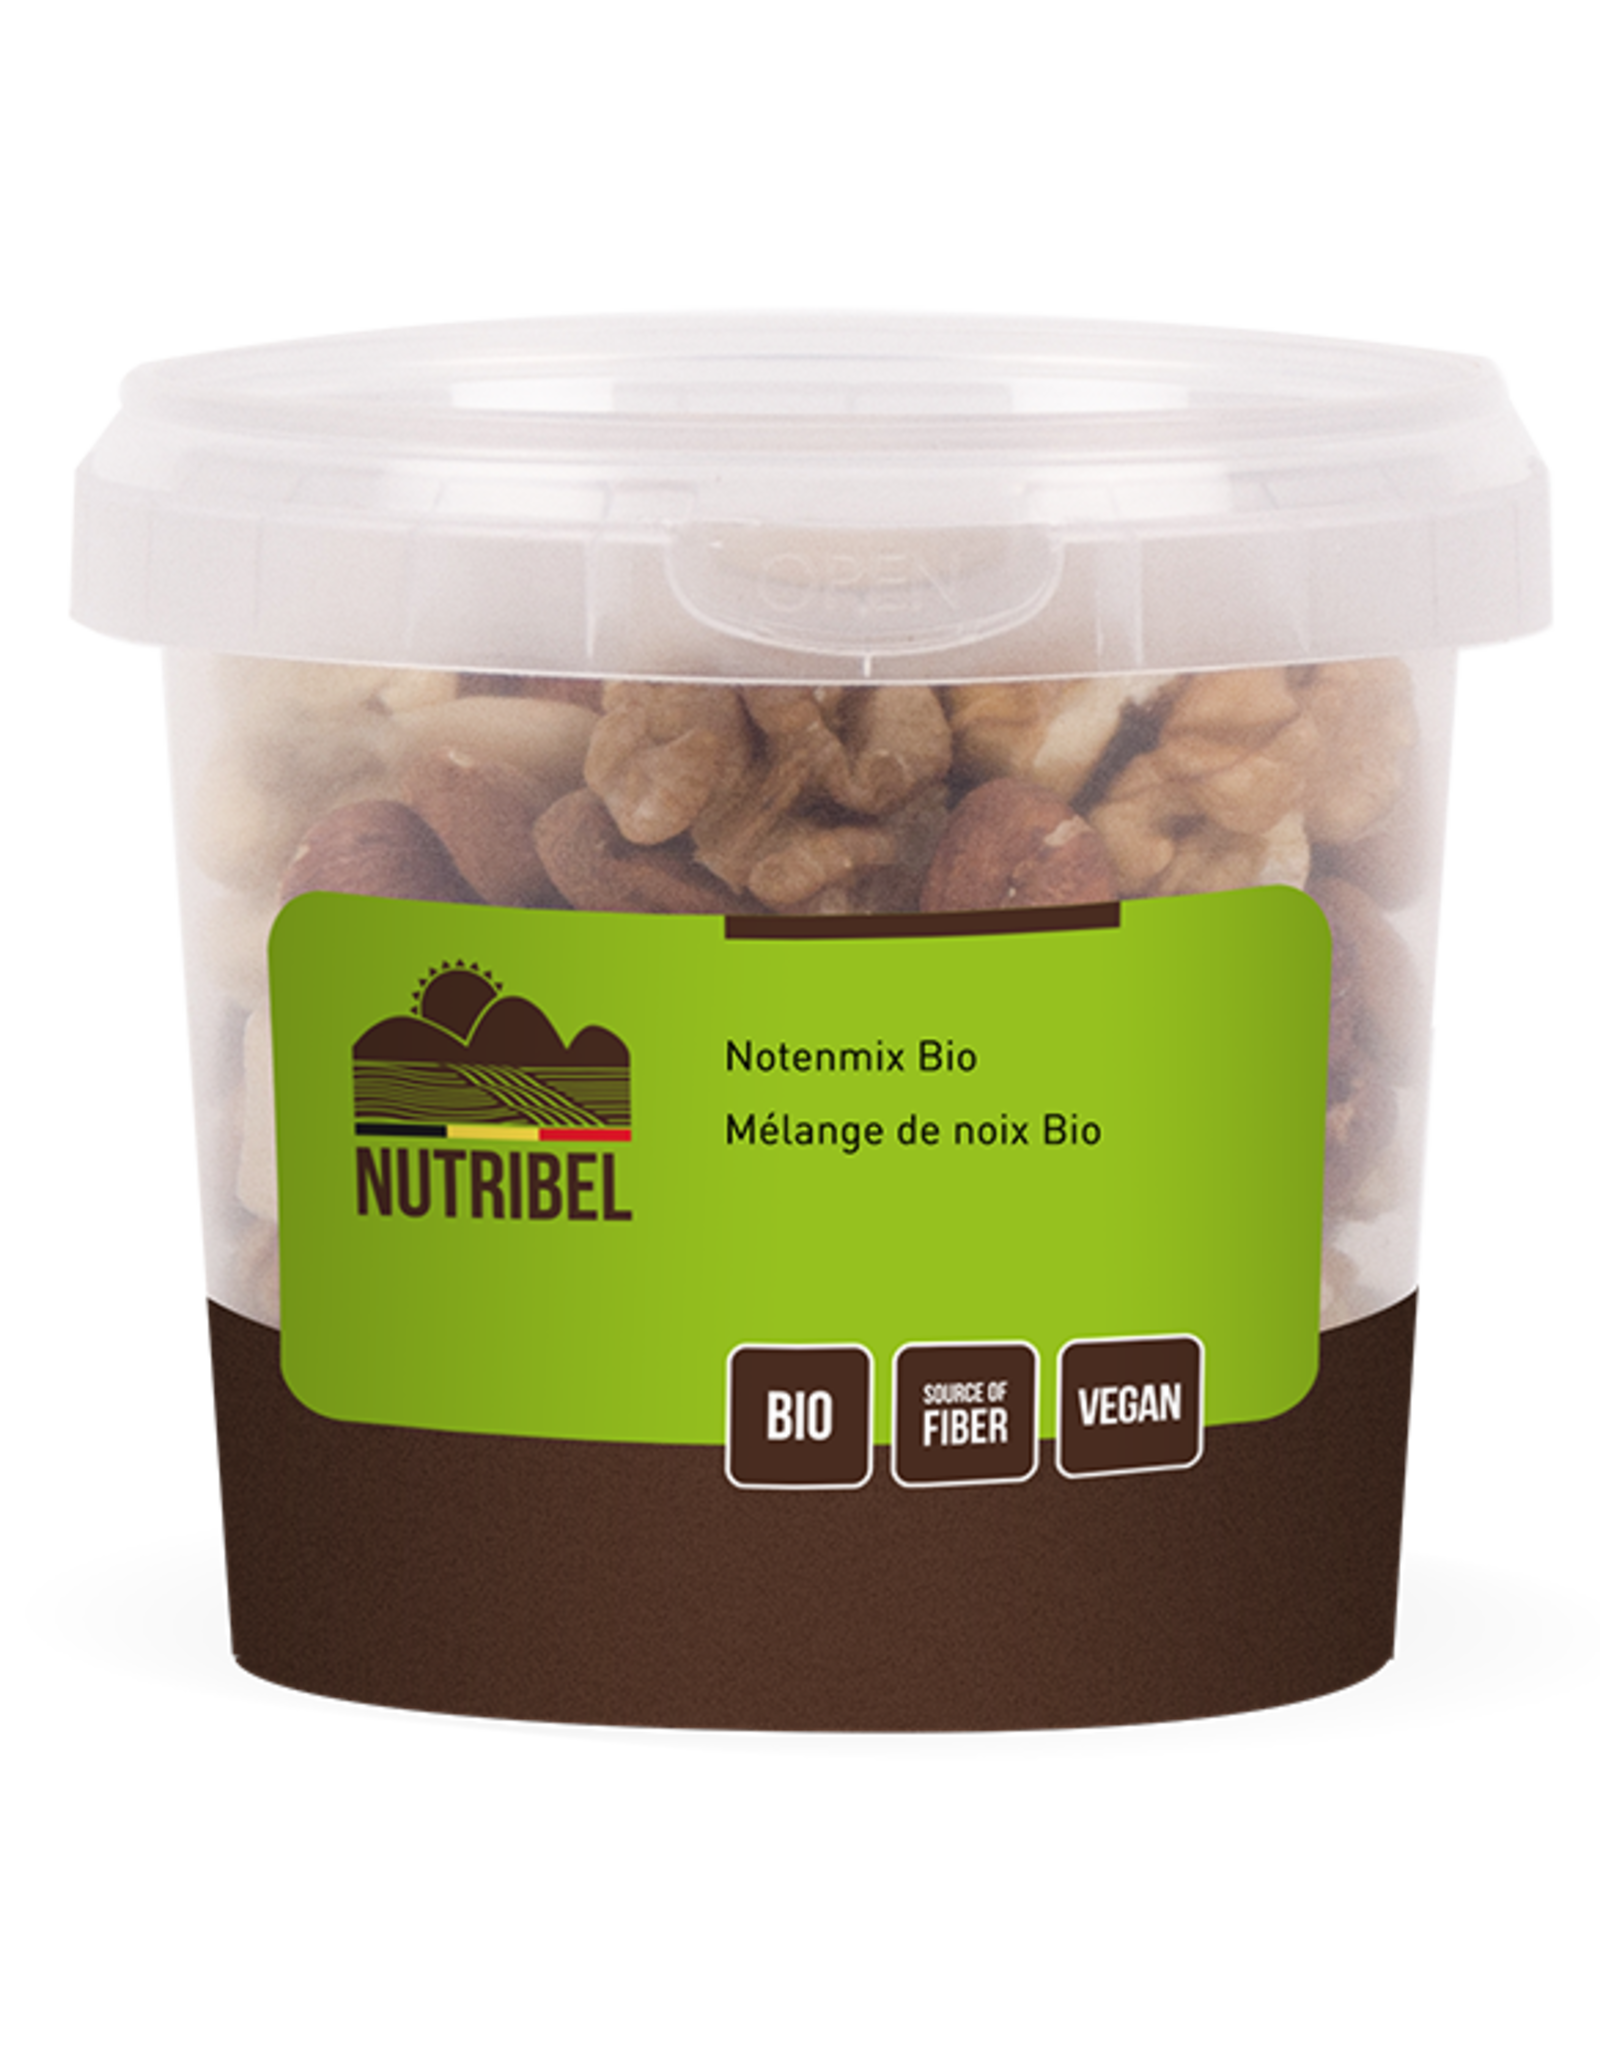 Nutribel Mélange de noix bio 190g